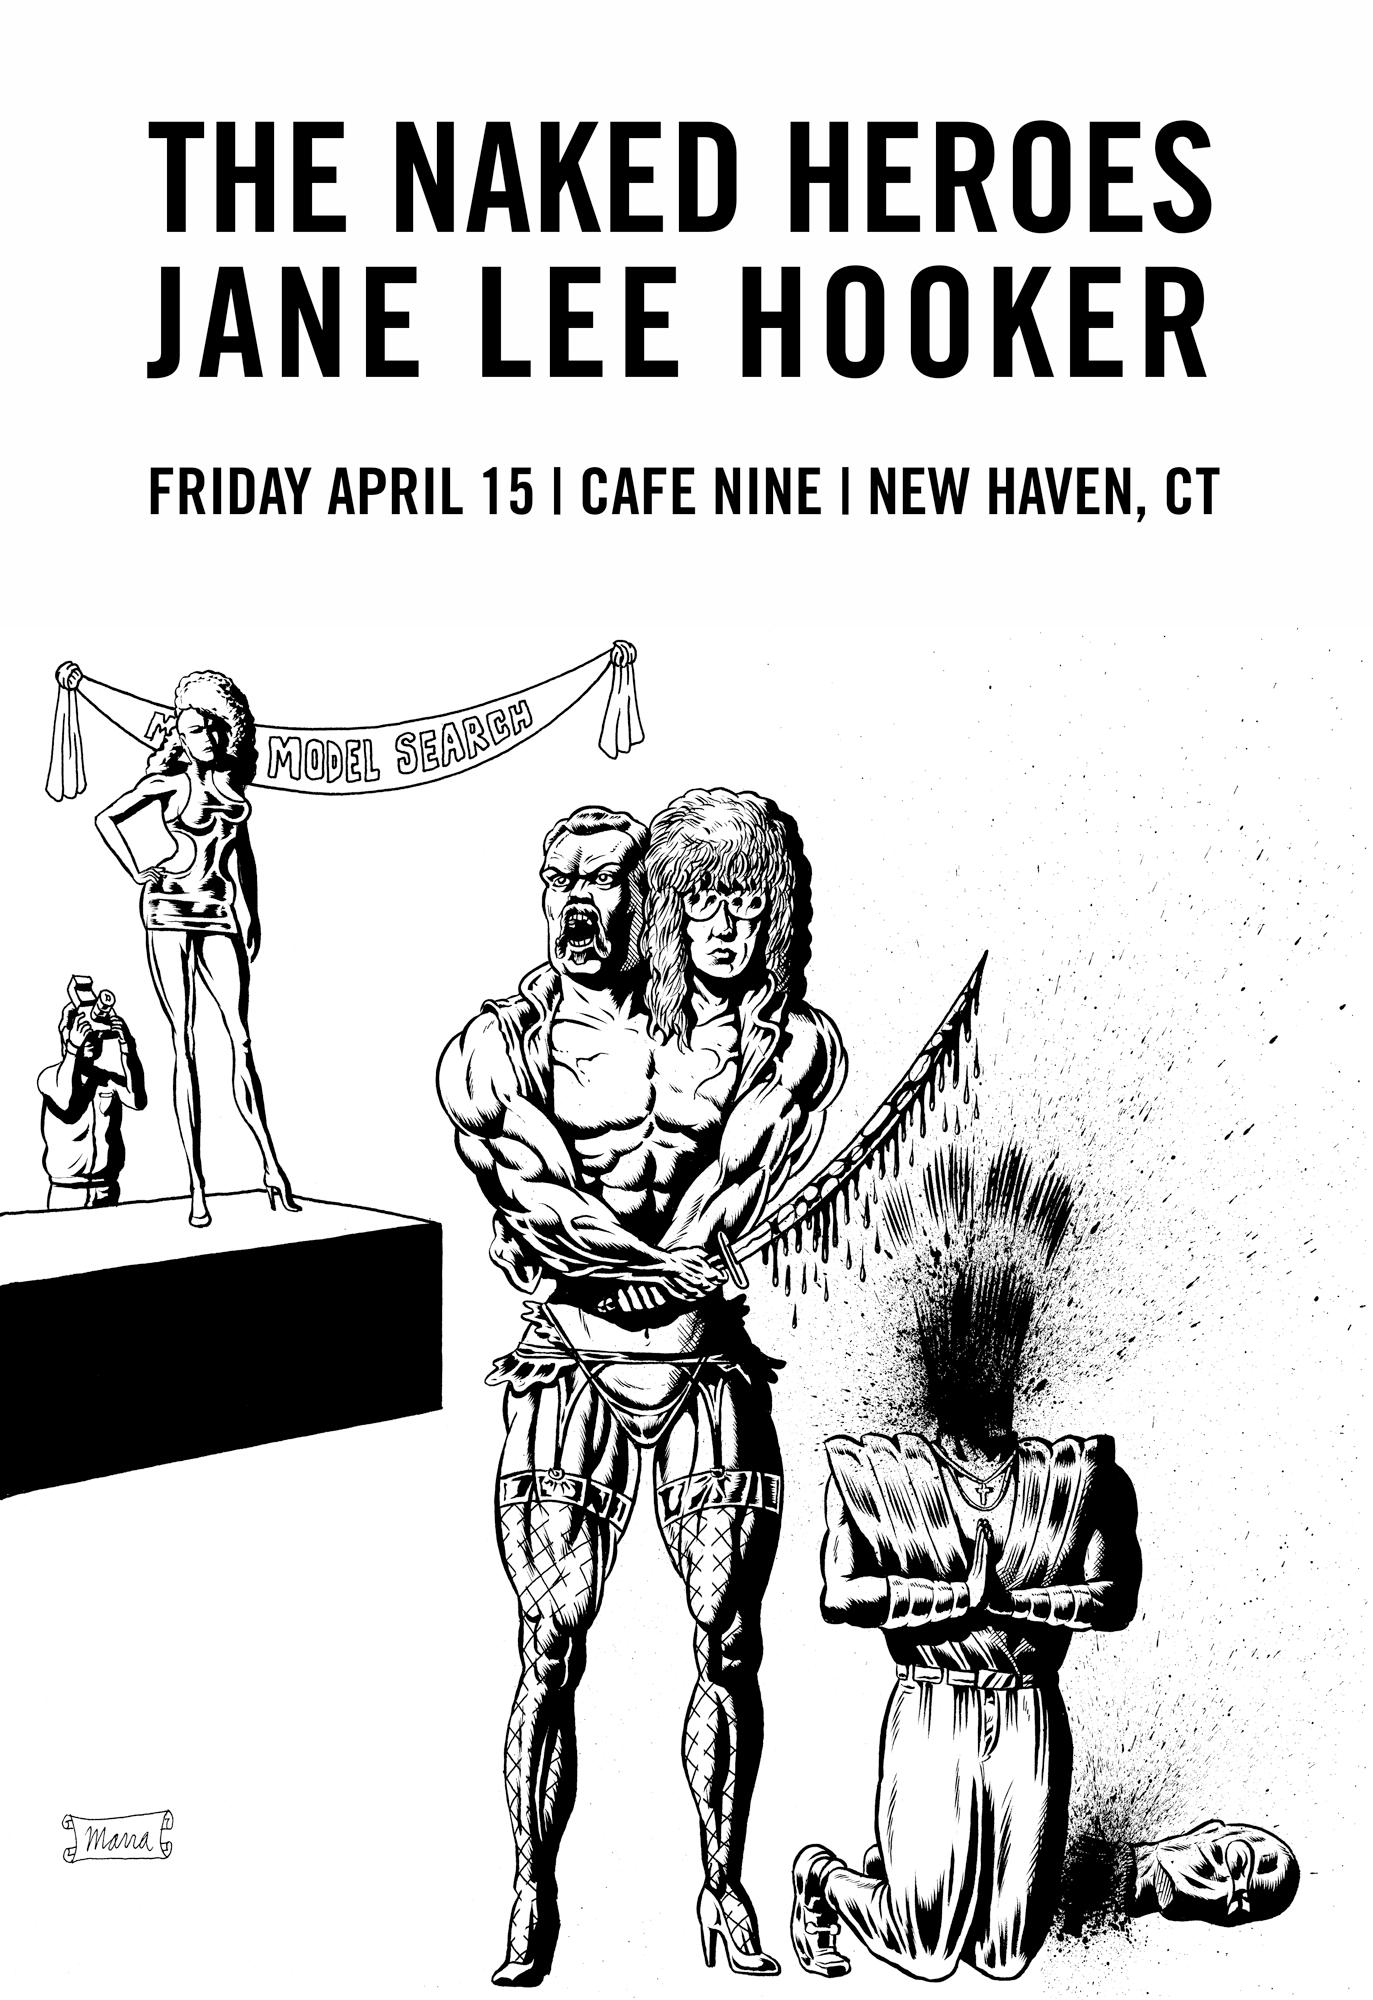 The-Naked-Heroes-Cafe-Nine